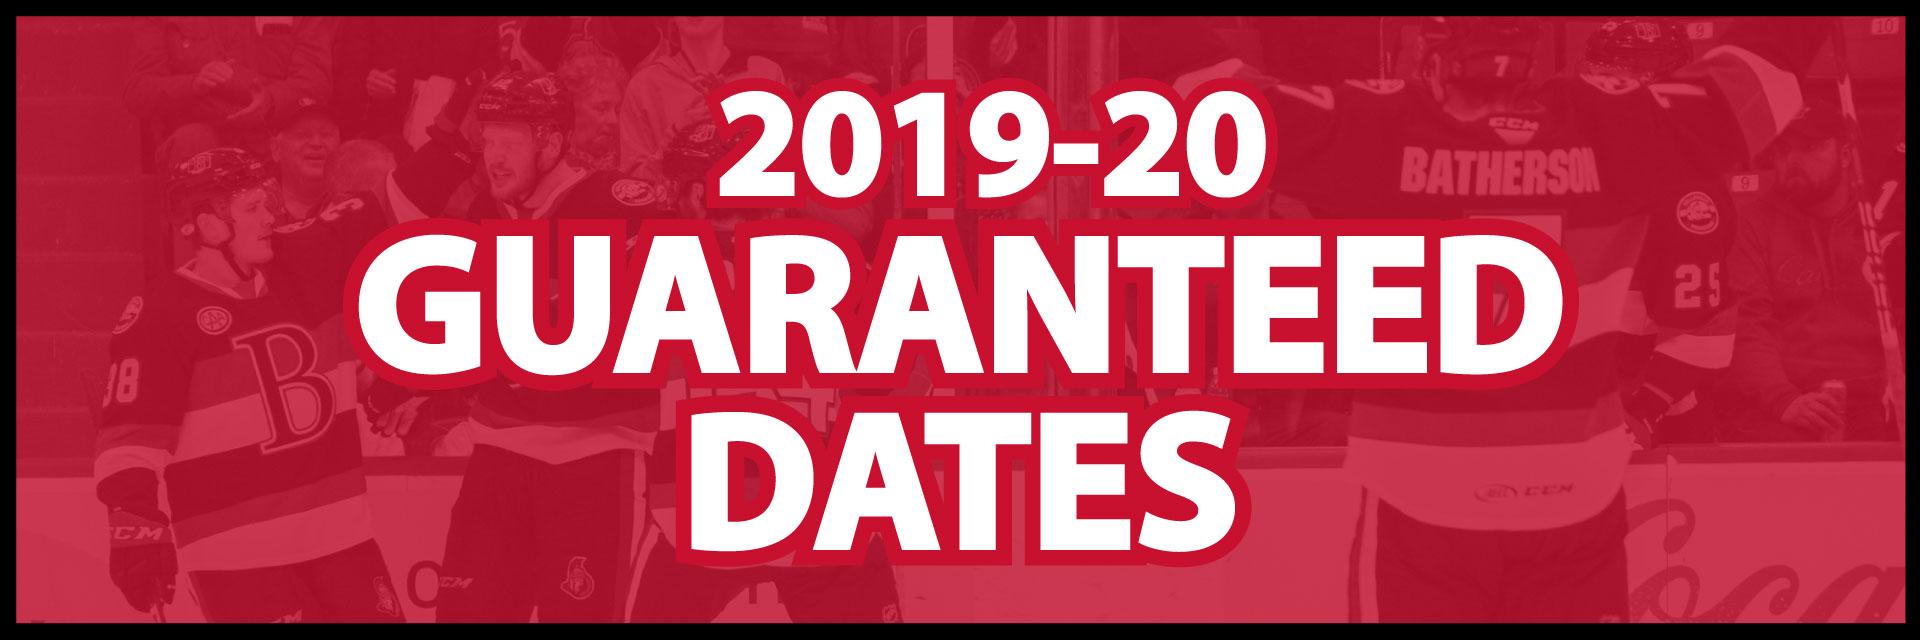 Guaranteed-Dates-header